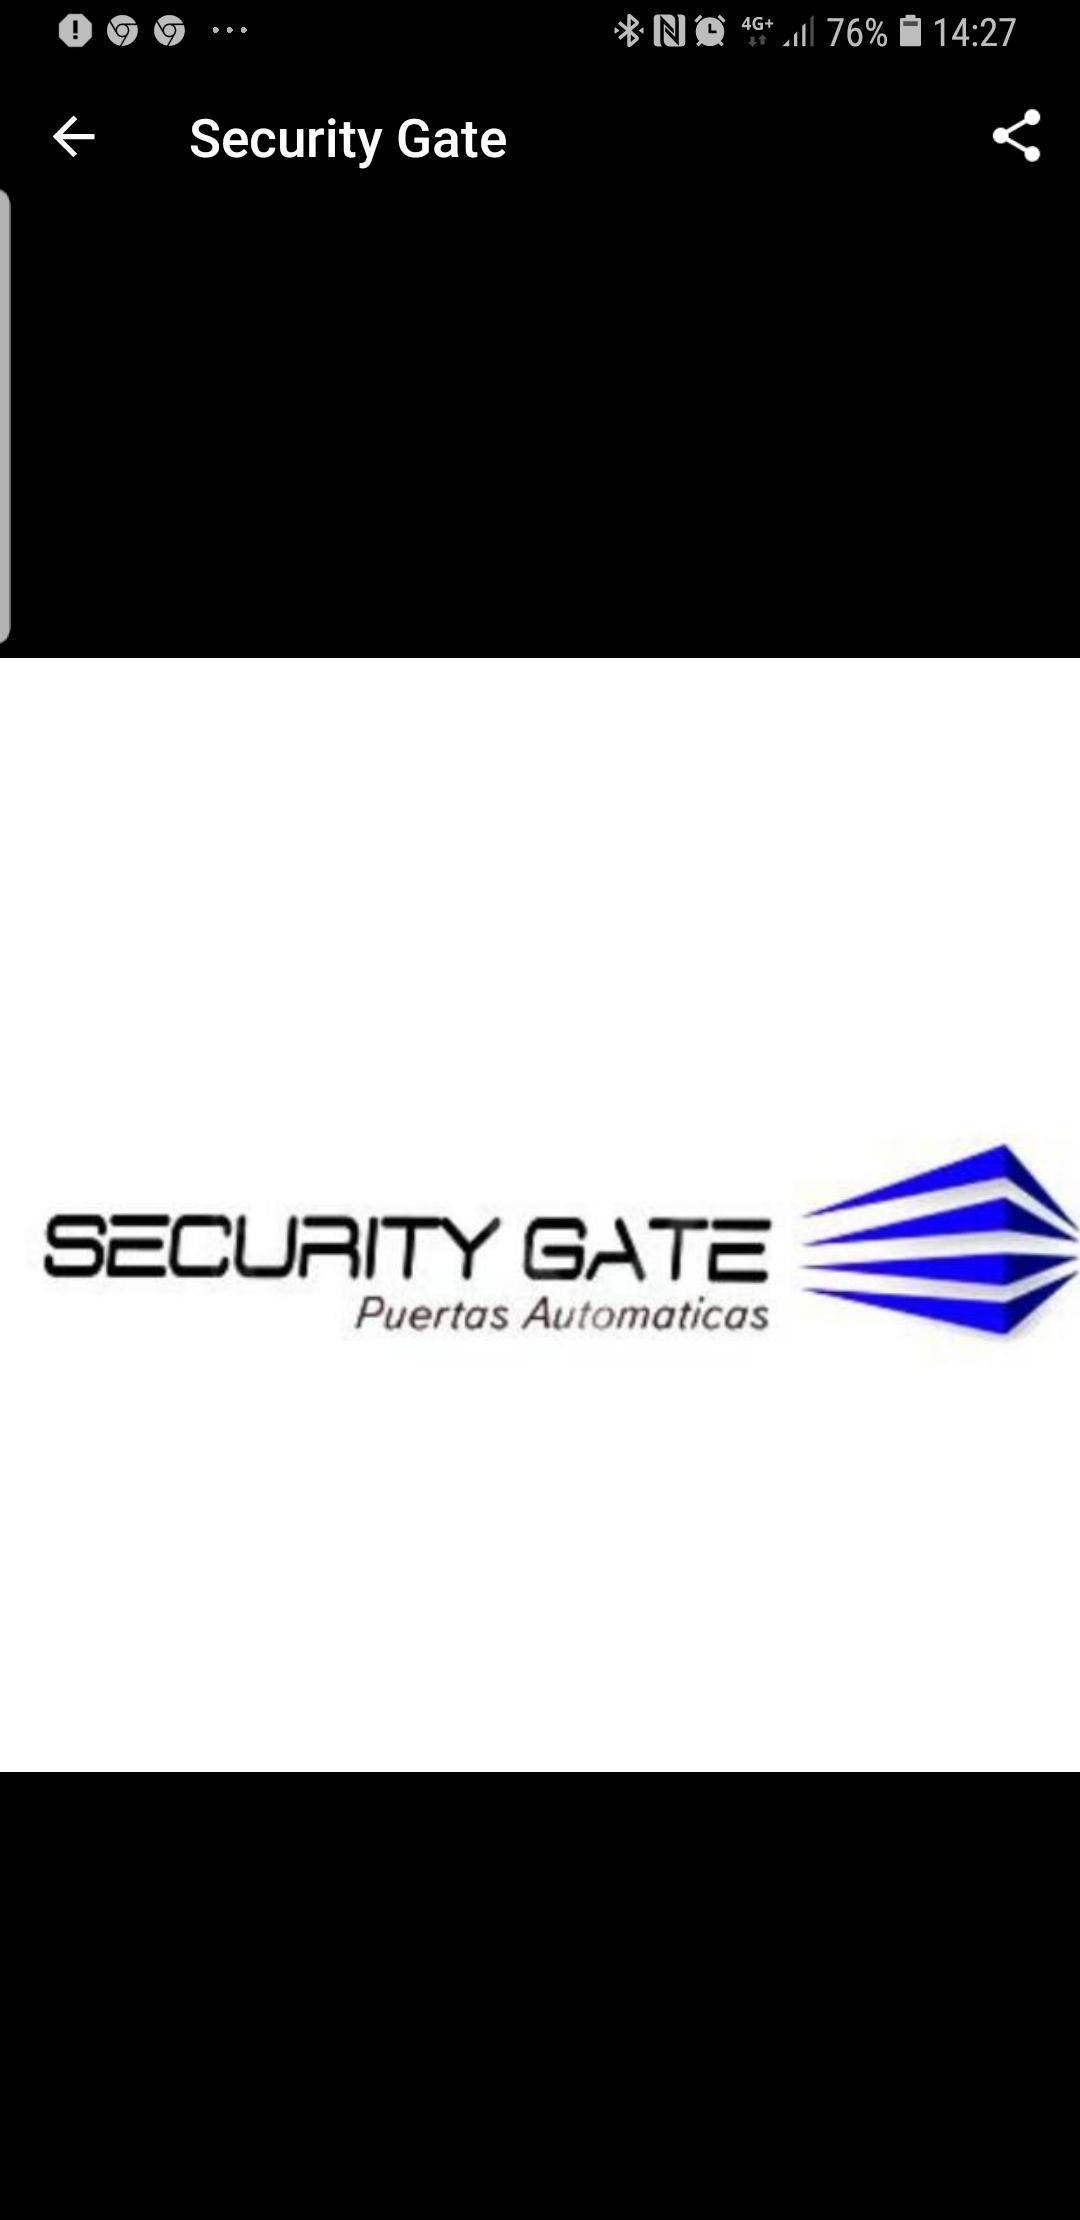 Security Gate Puertas Automáticas